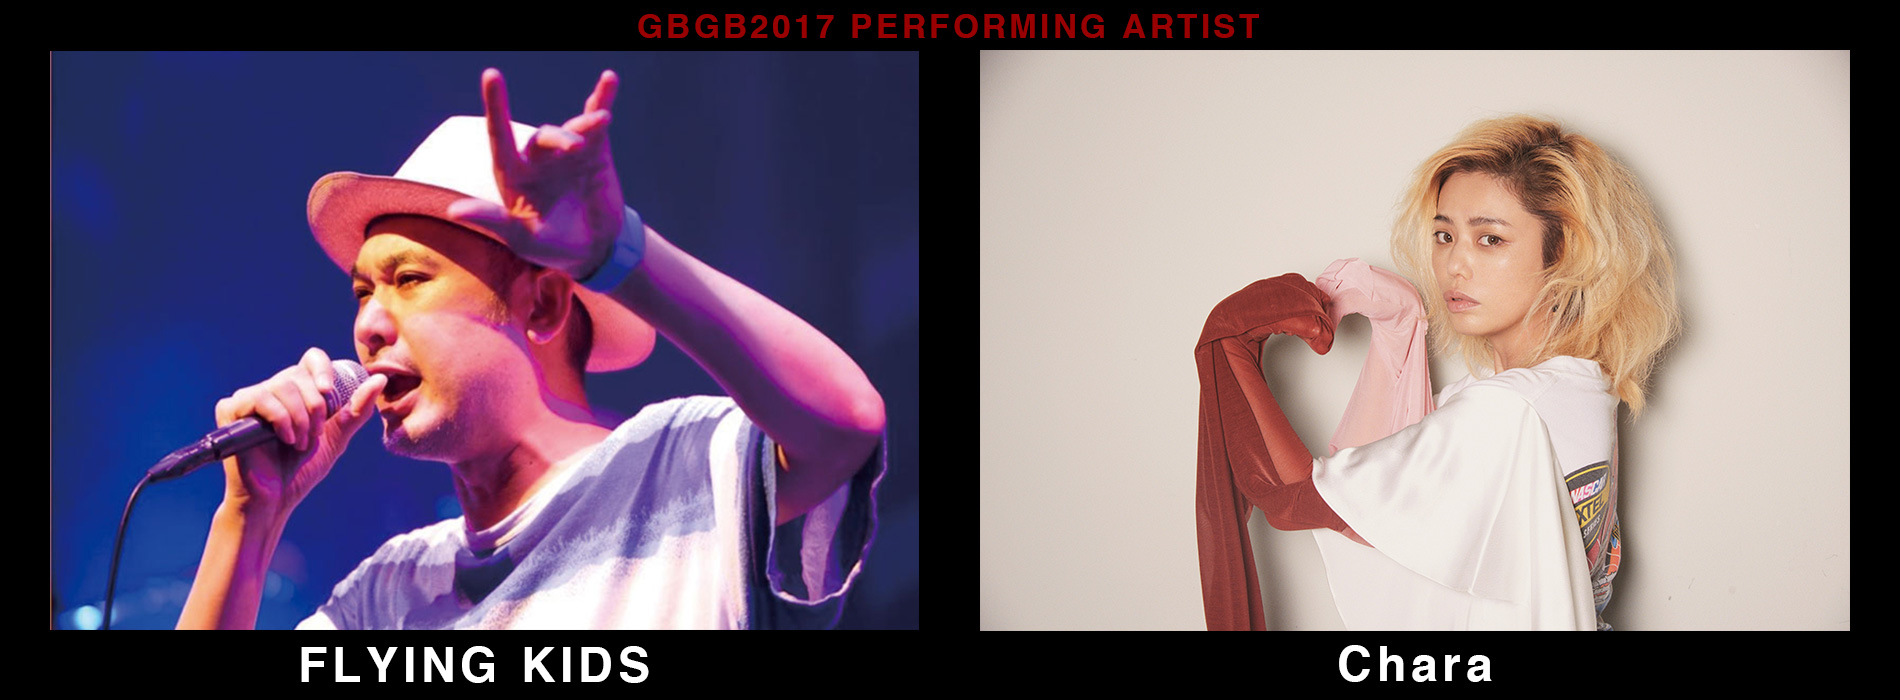 GBGB2017 ARTIST